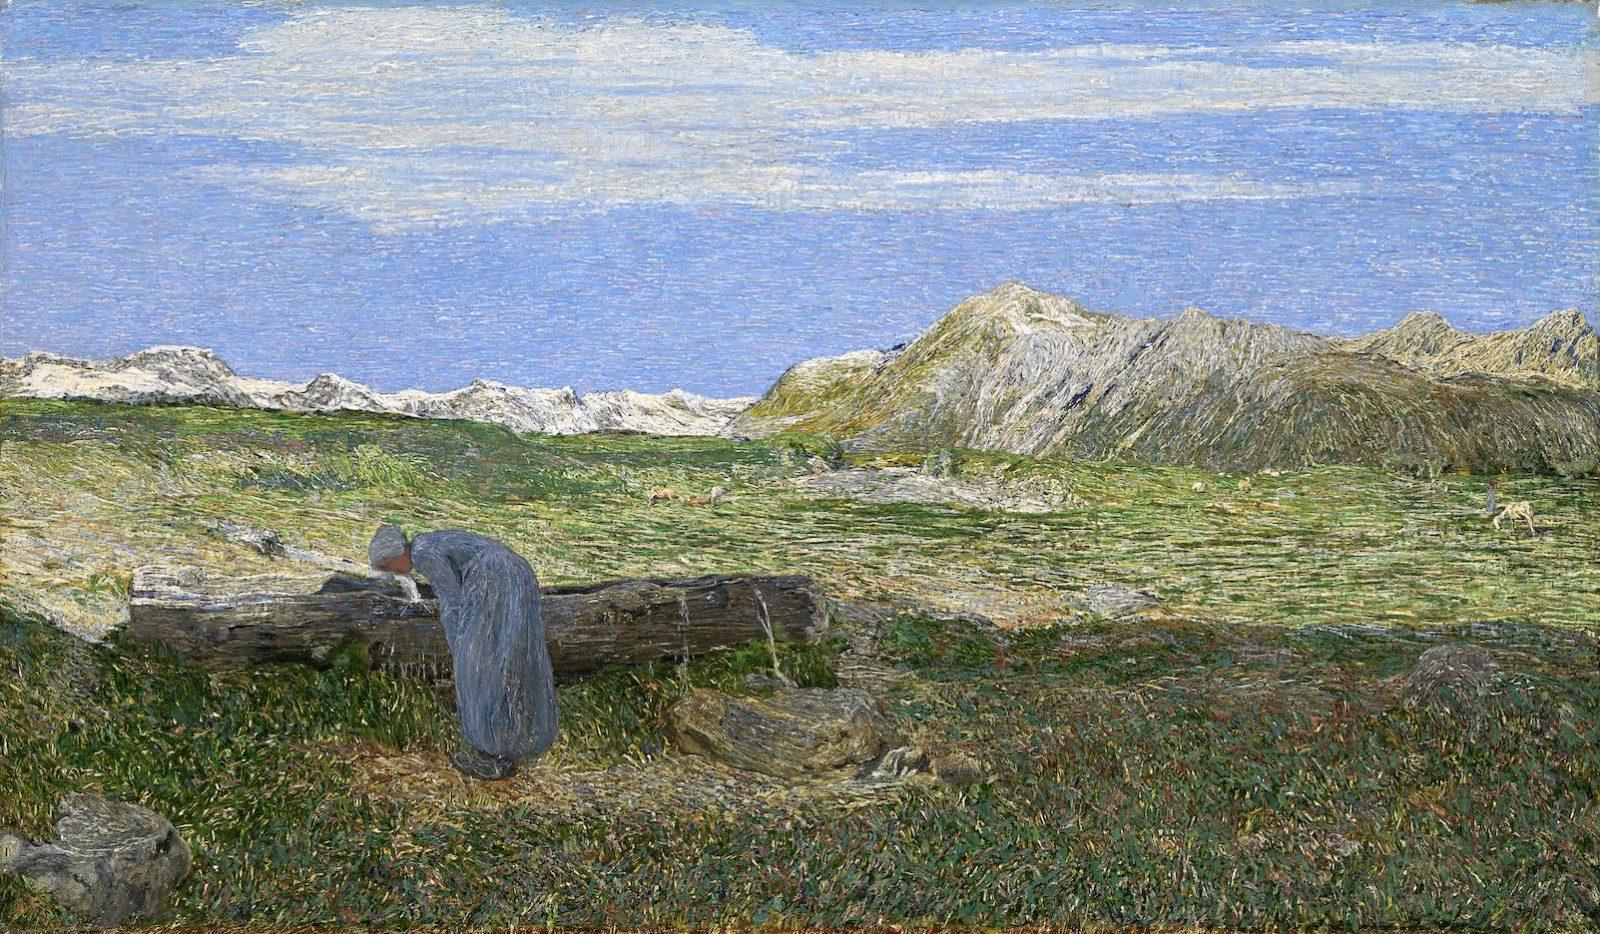 Giovanni Segantini : Paysage alpin avec femme à la fontaine,